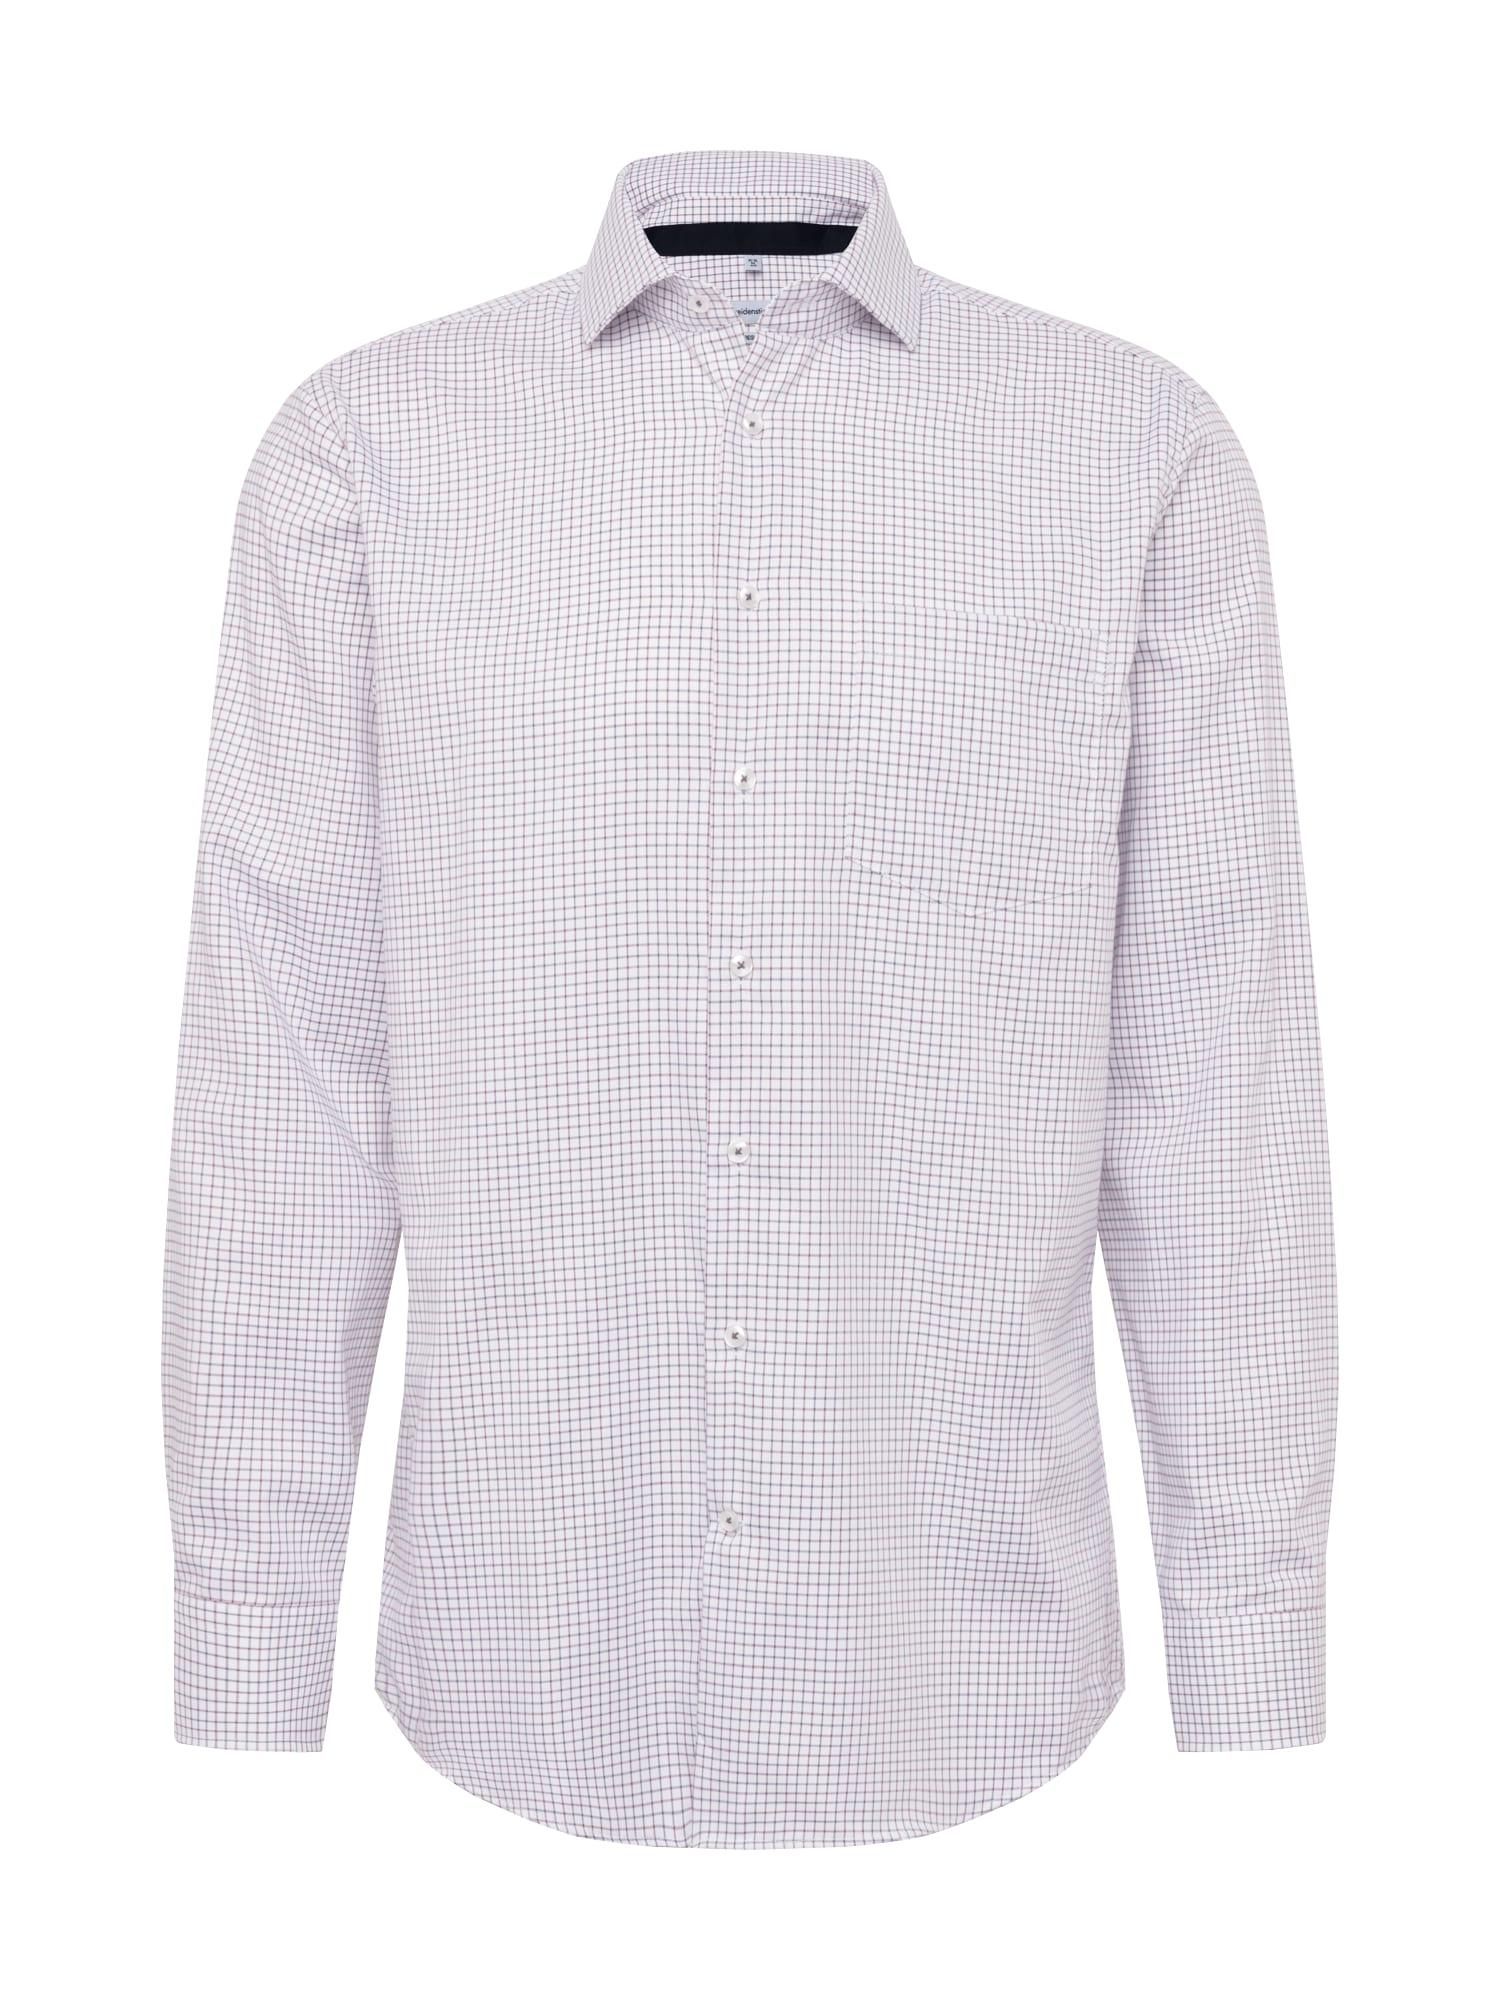 SEIDENSTICKER Marškiniai balta / rožių spalva